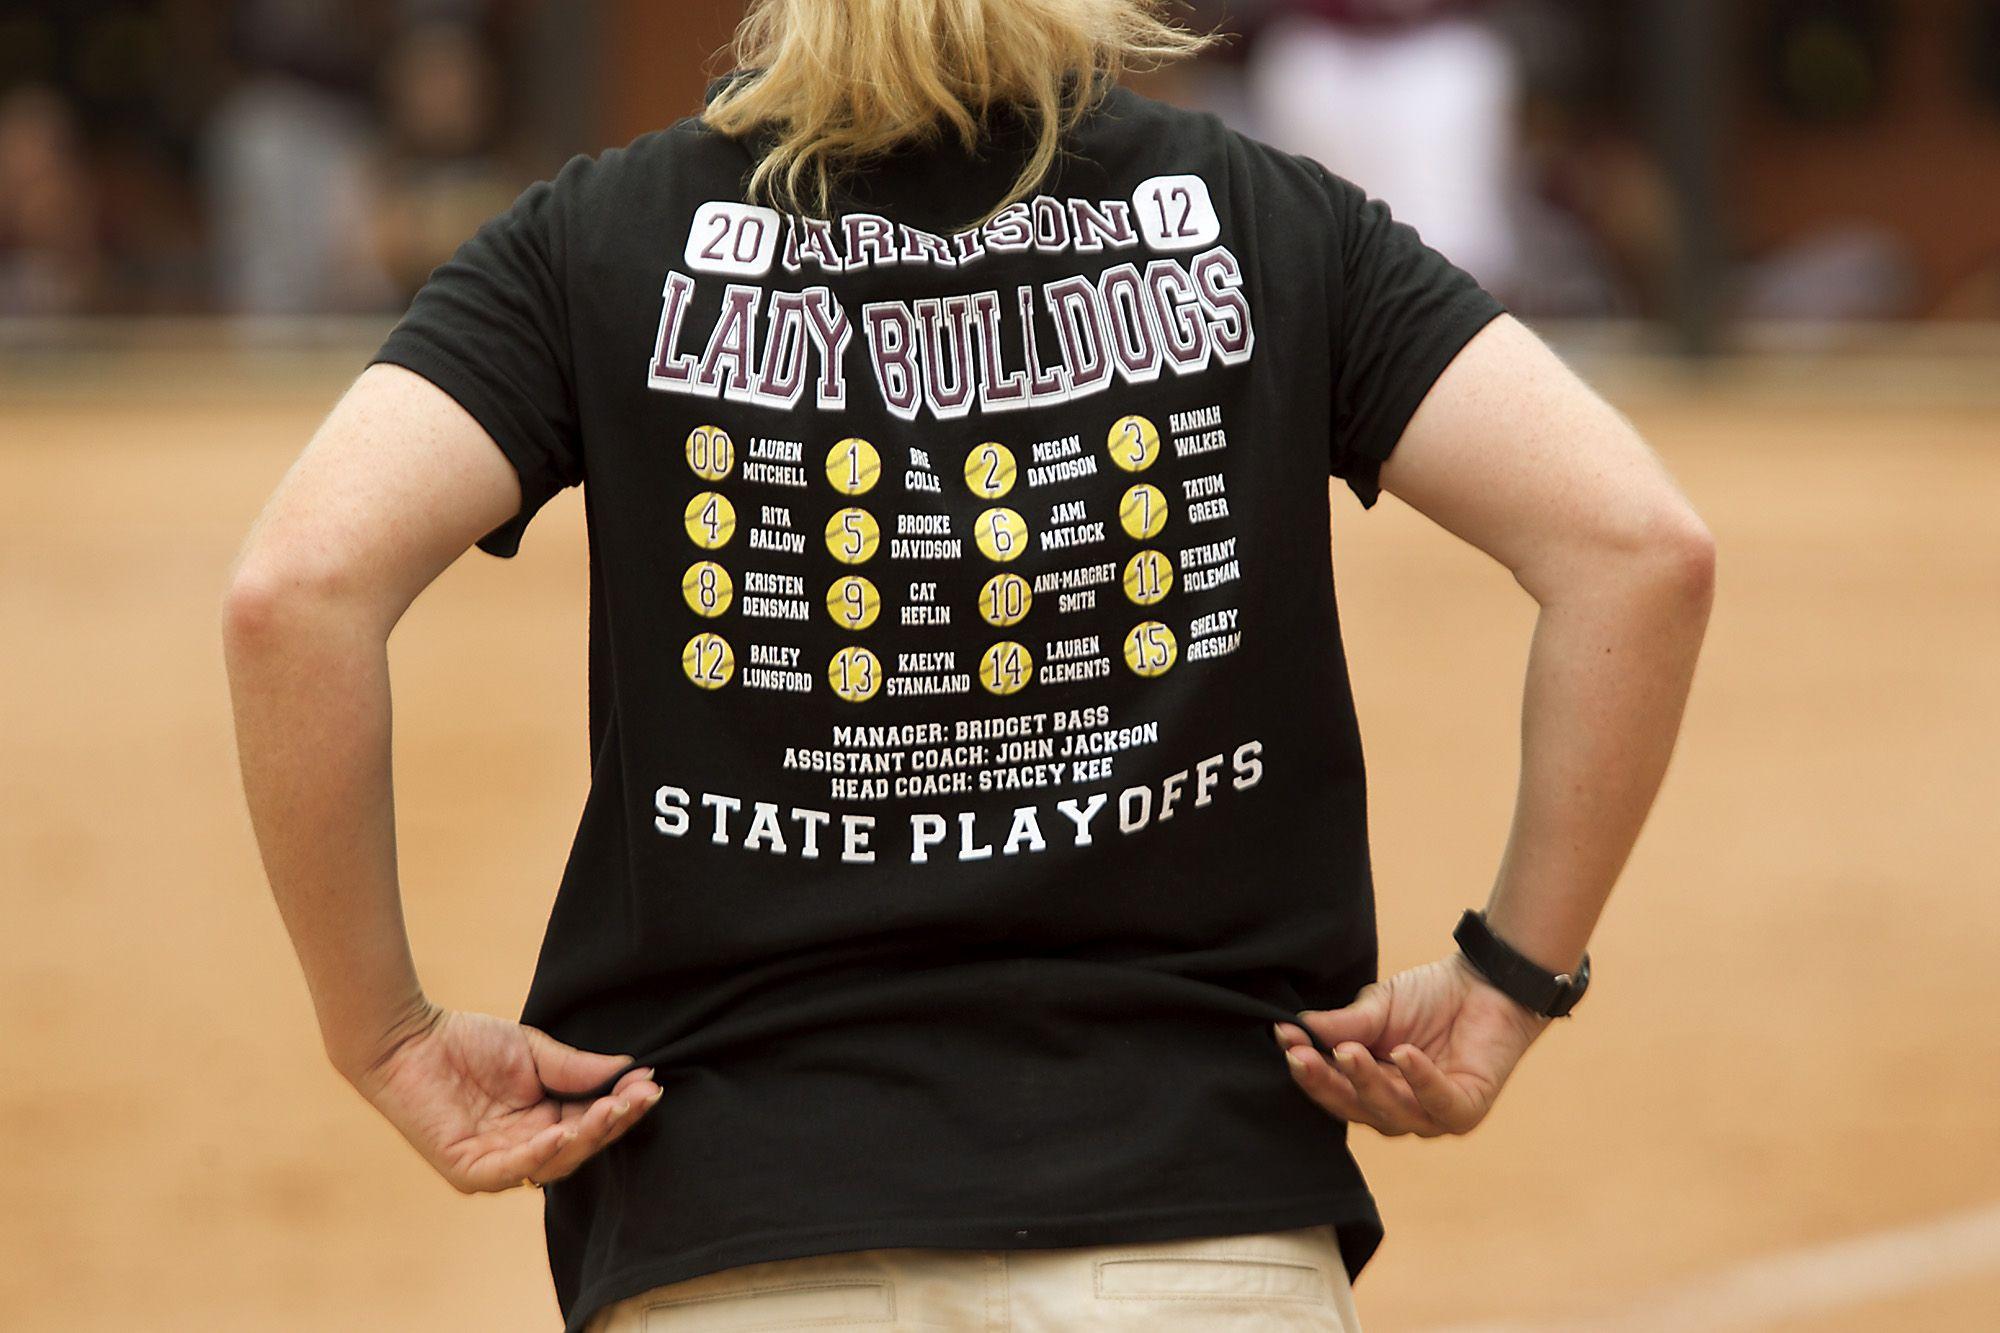 053112 Uil Soft Softball Design Volleyball Shirts Baseball Uniforms